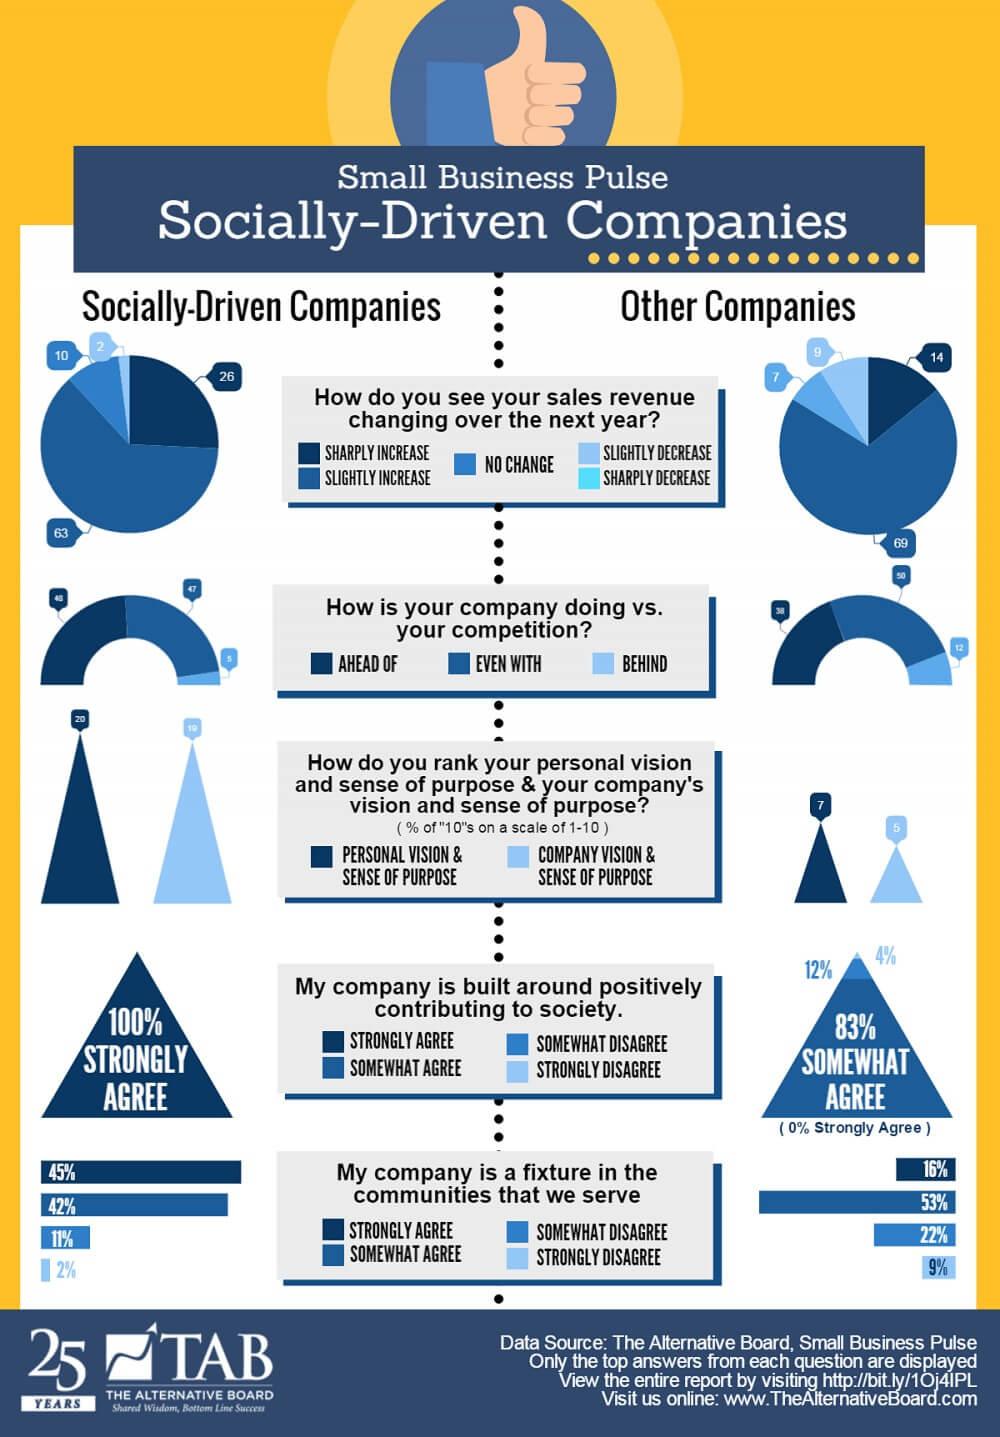 TAB-BPS-Socially-Driven-Companies-Full-Size-e1478195980538